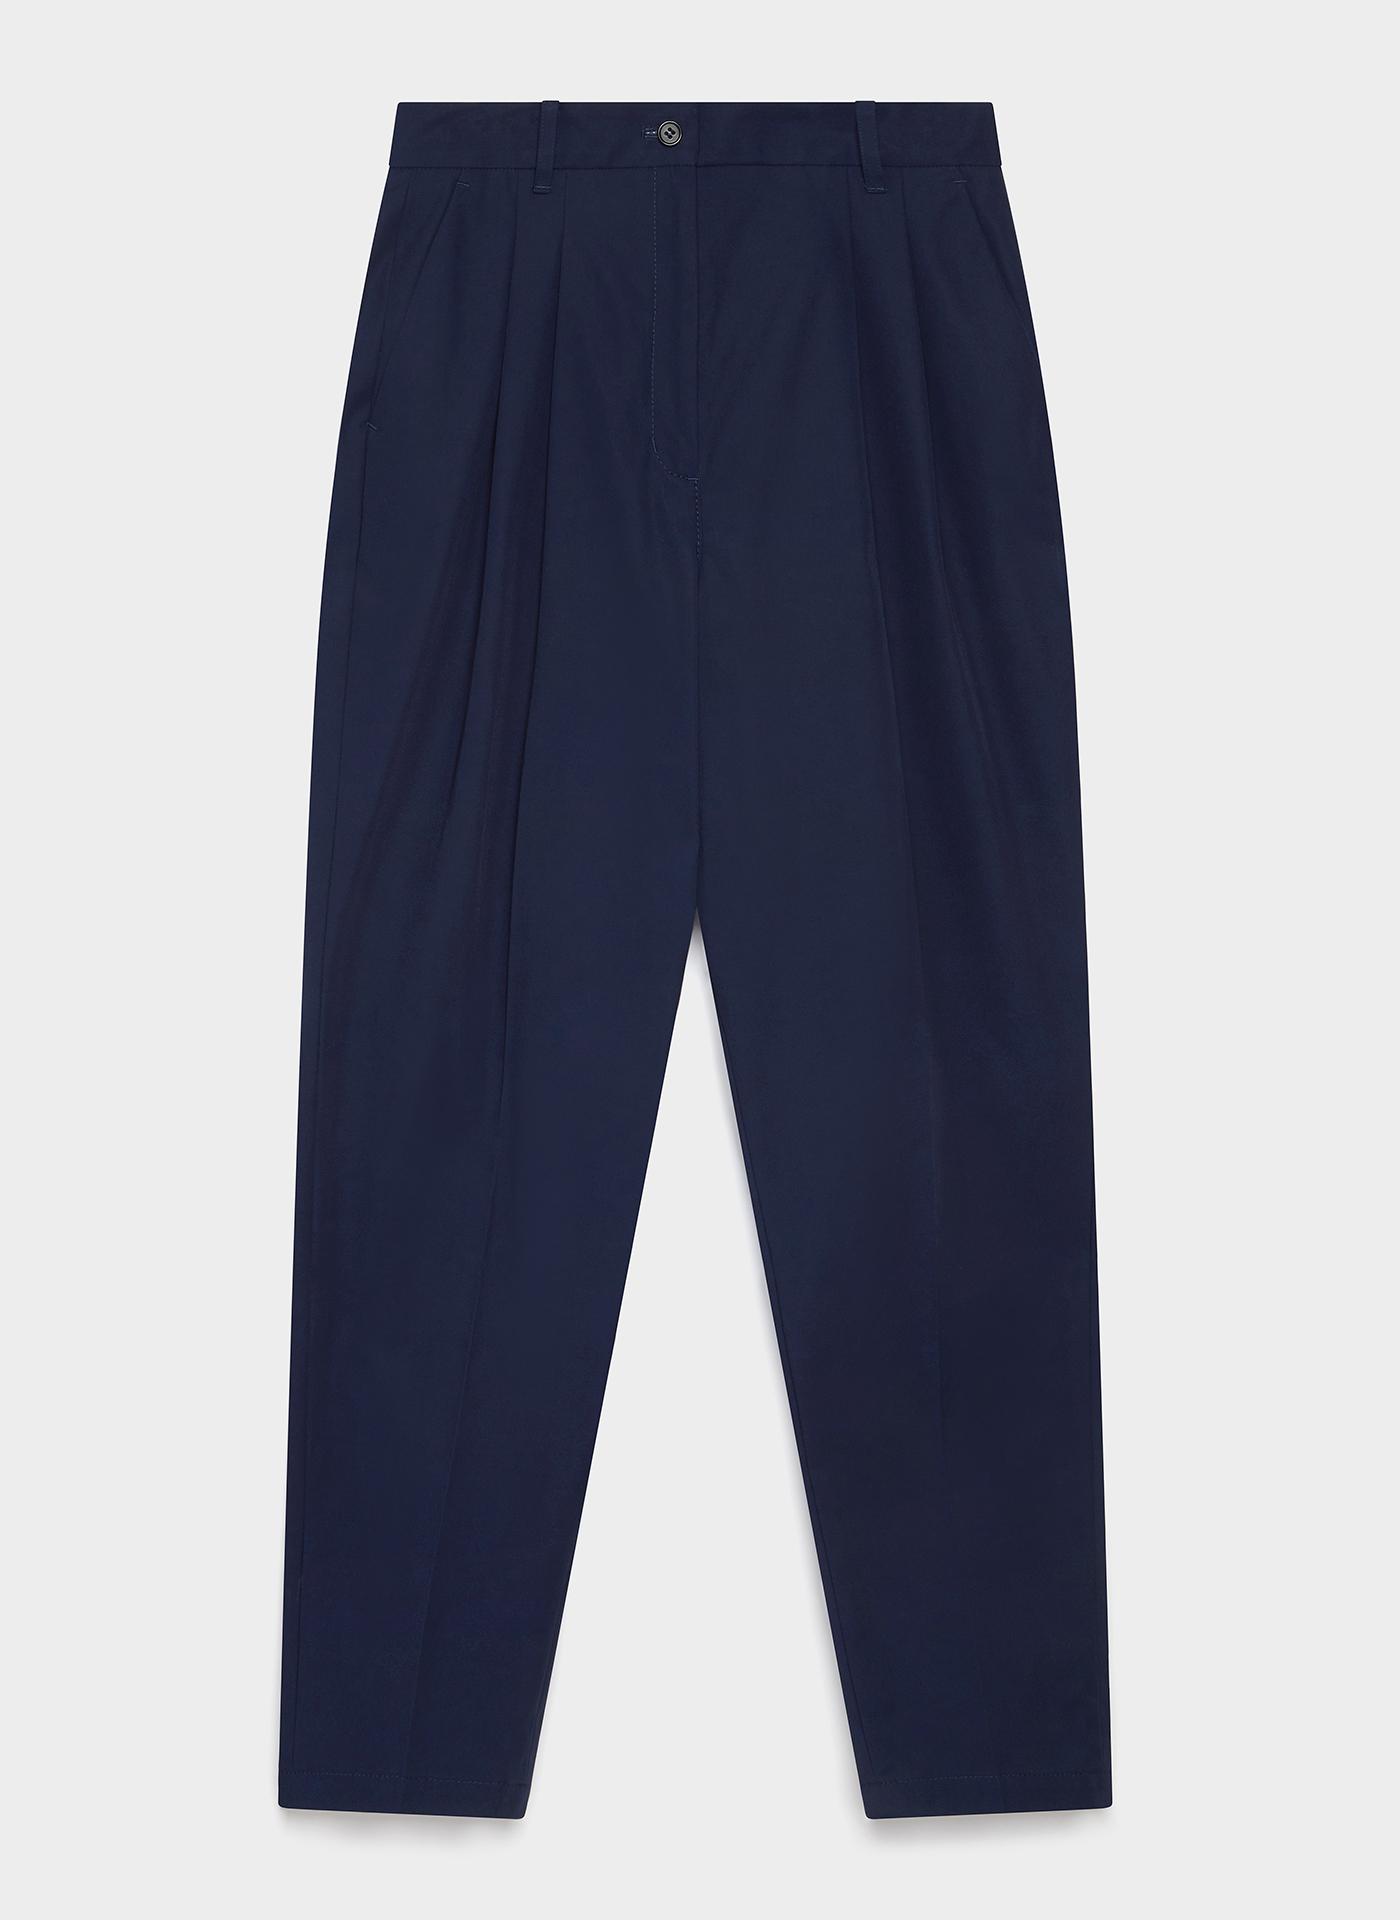 J&M dark blue trousers